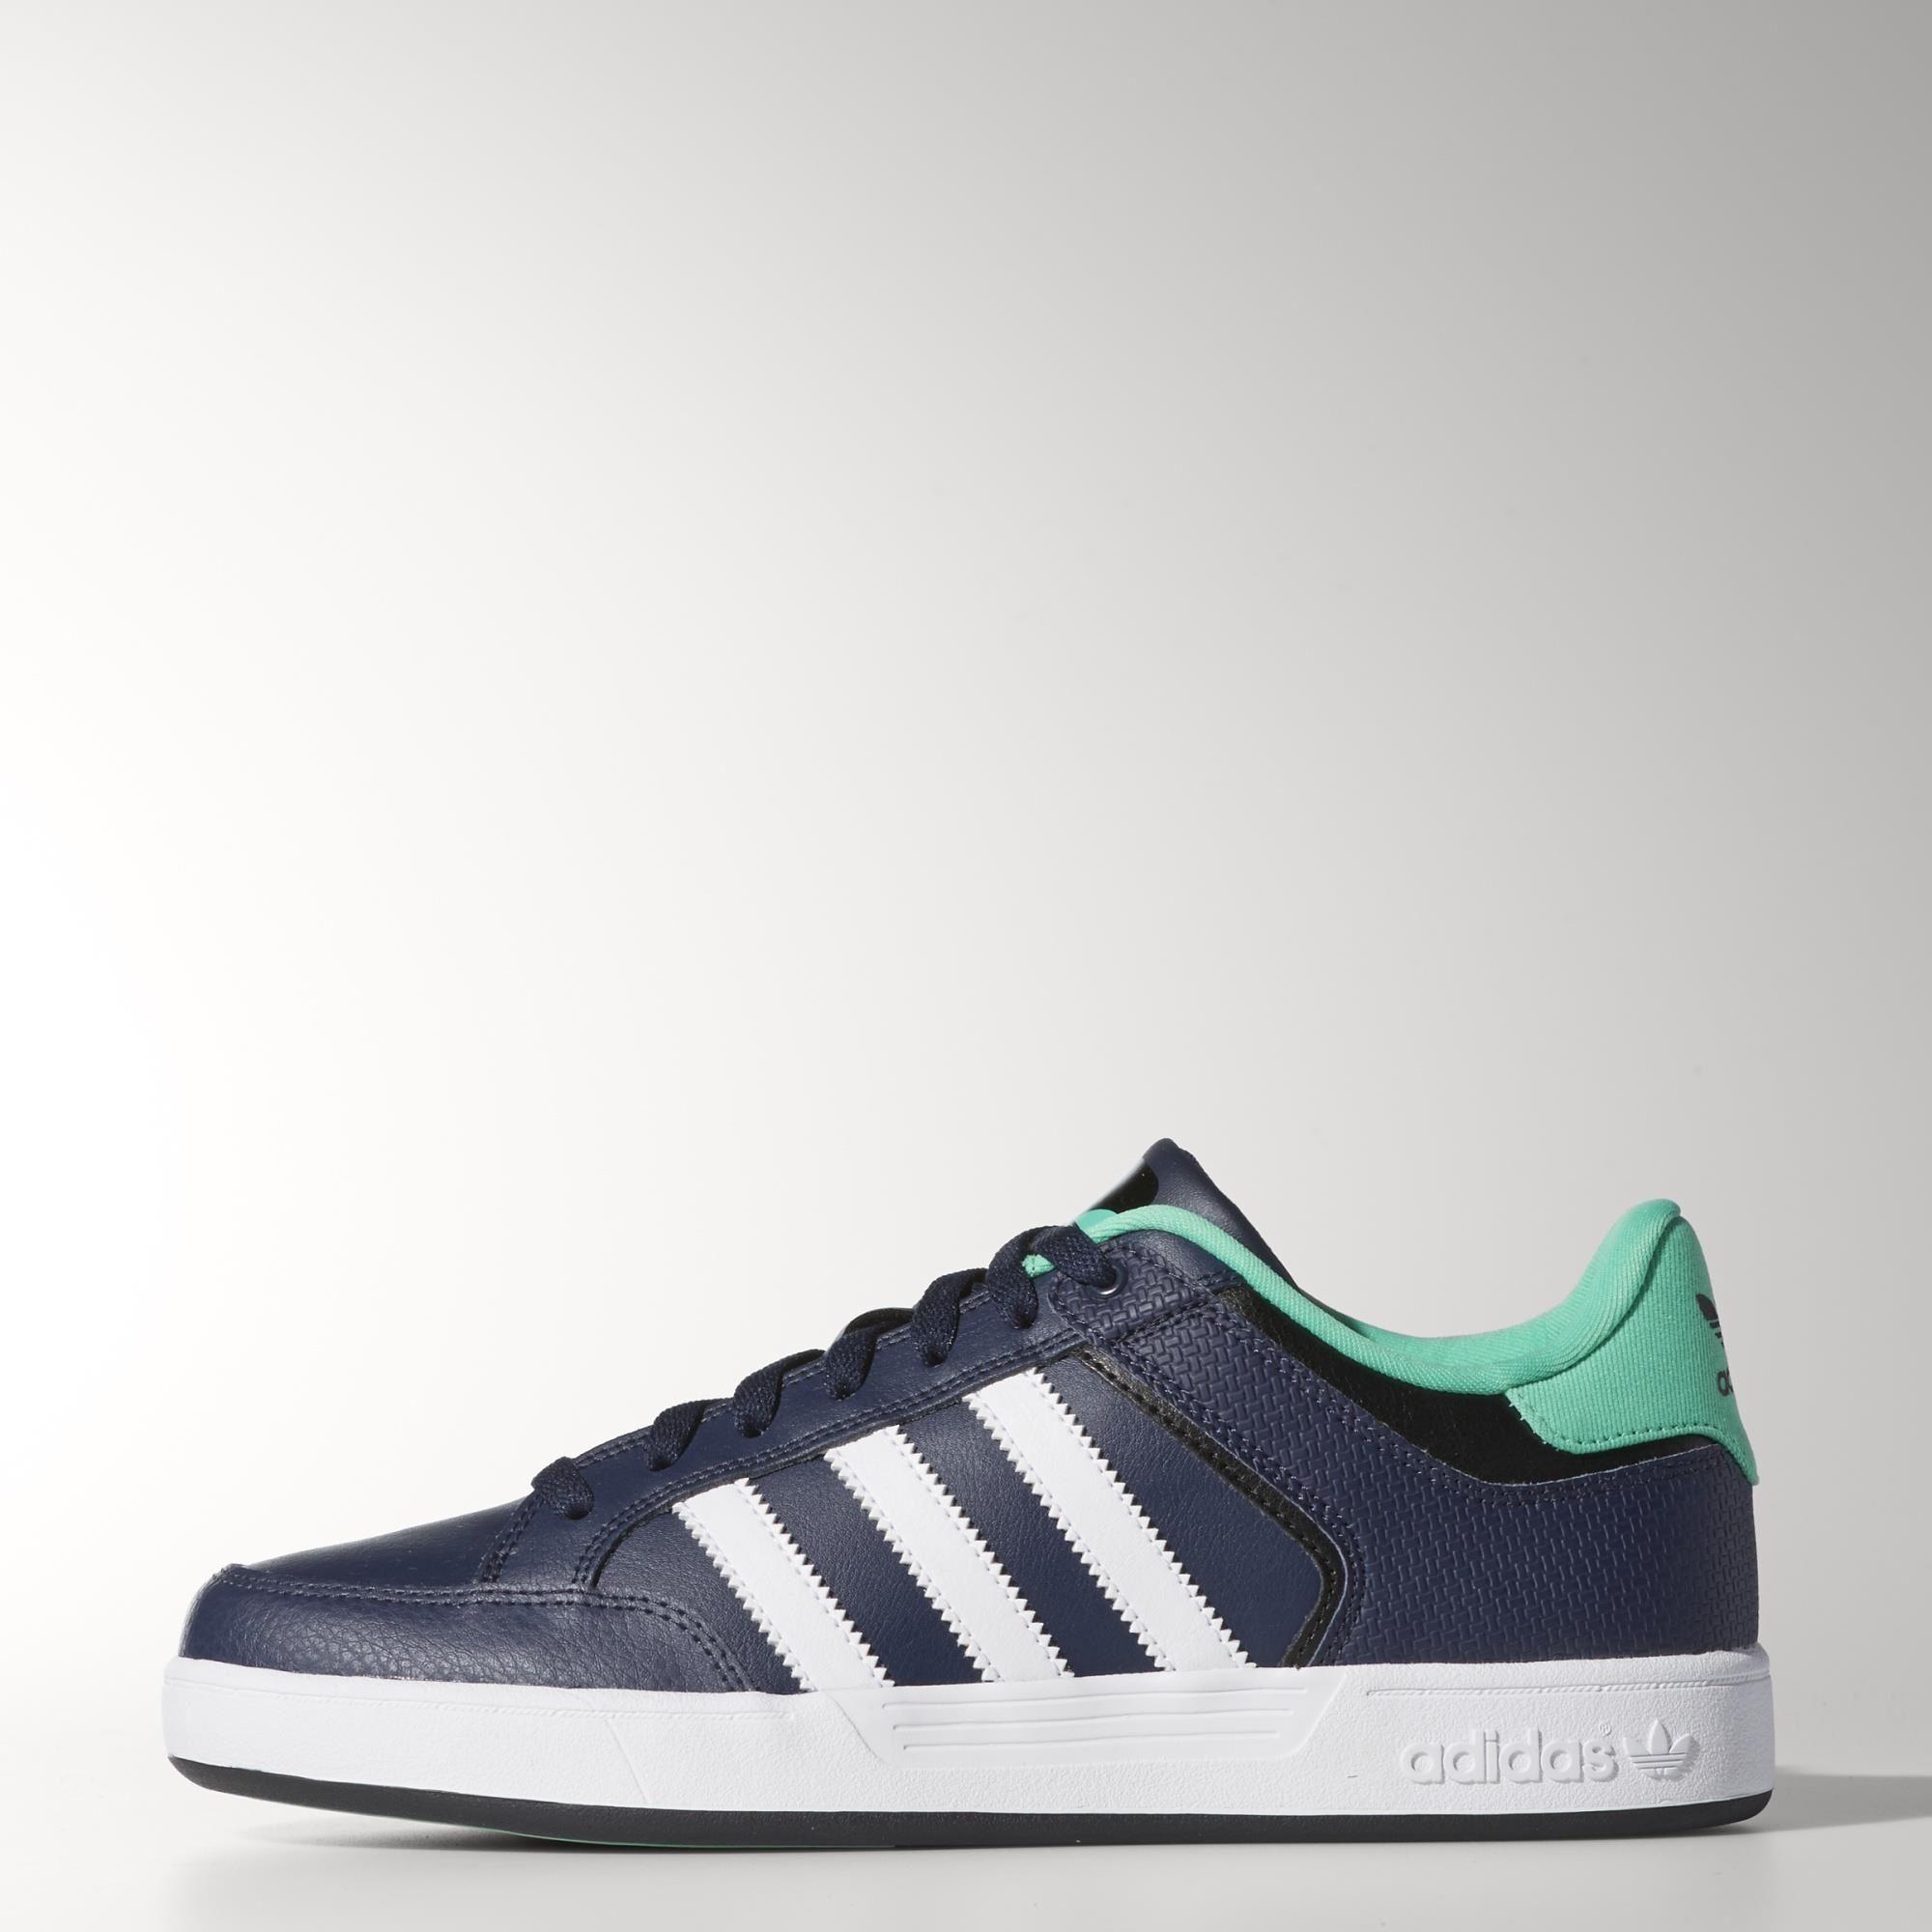 sims 4 jordan shoes for adults cccp 809211